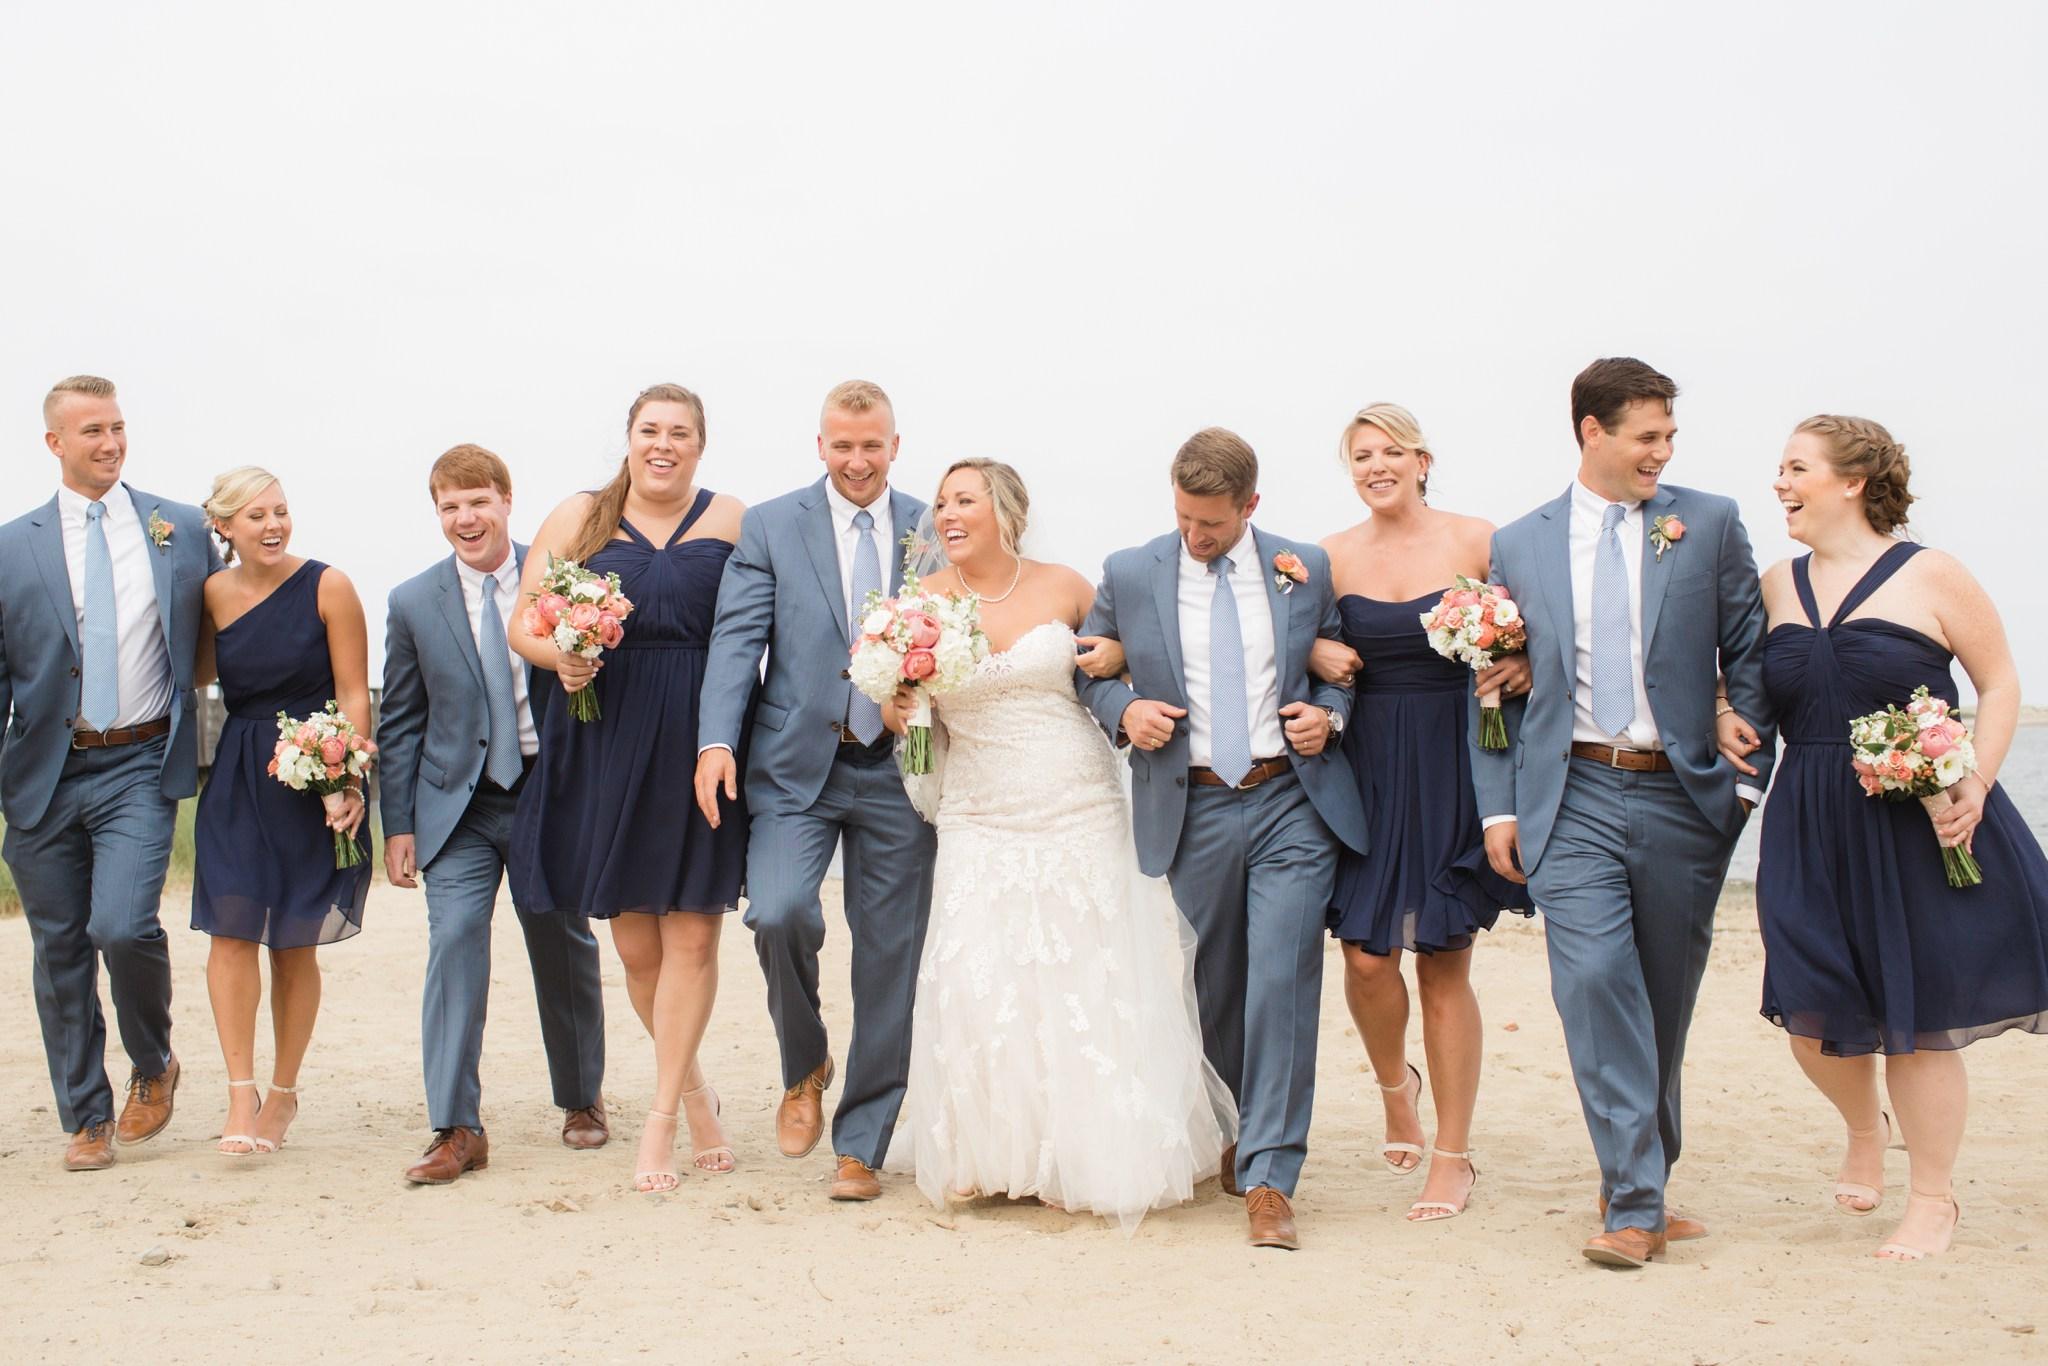 duxbury_bay_maritime_school_wedding_deborah_zoe_0027.JPG